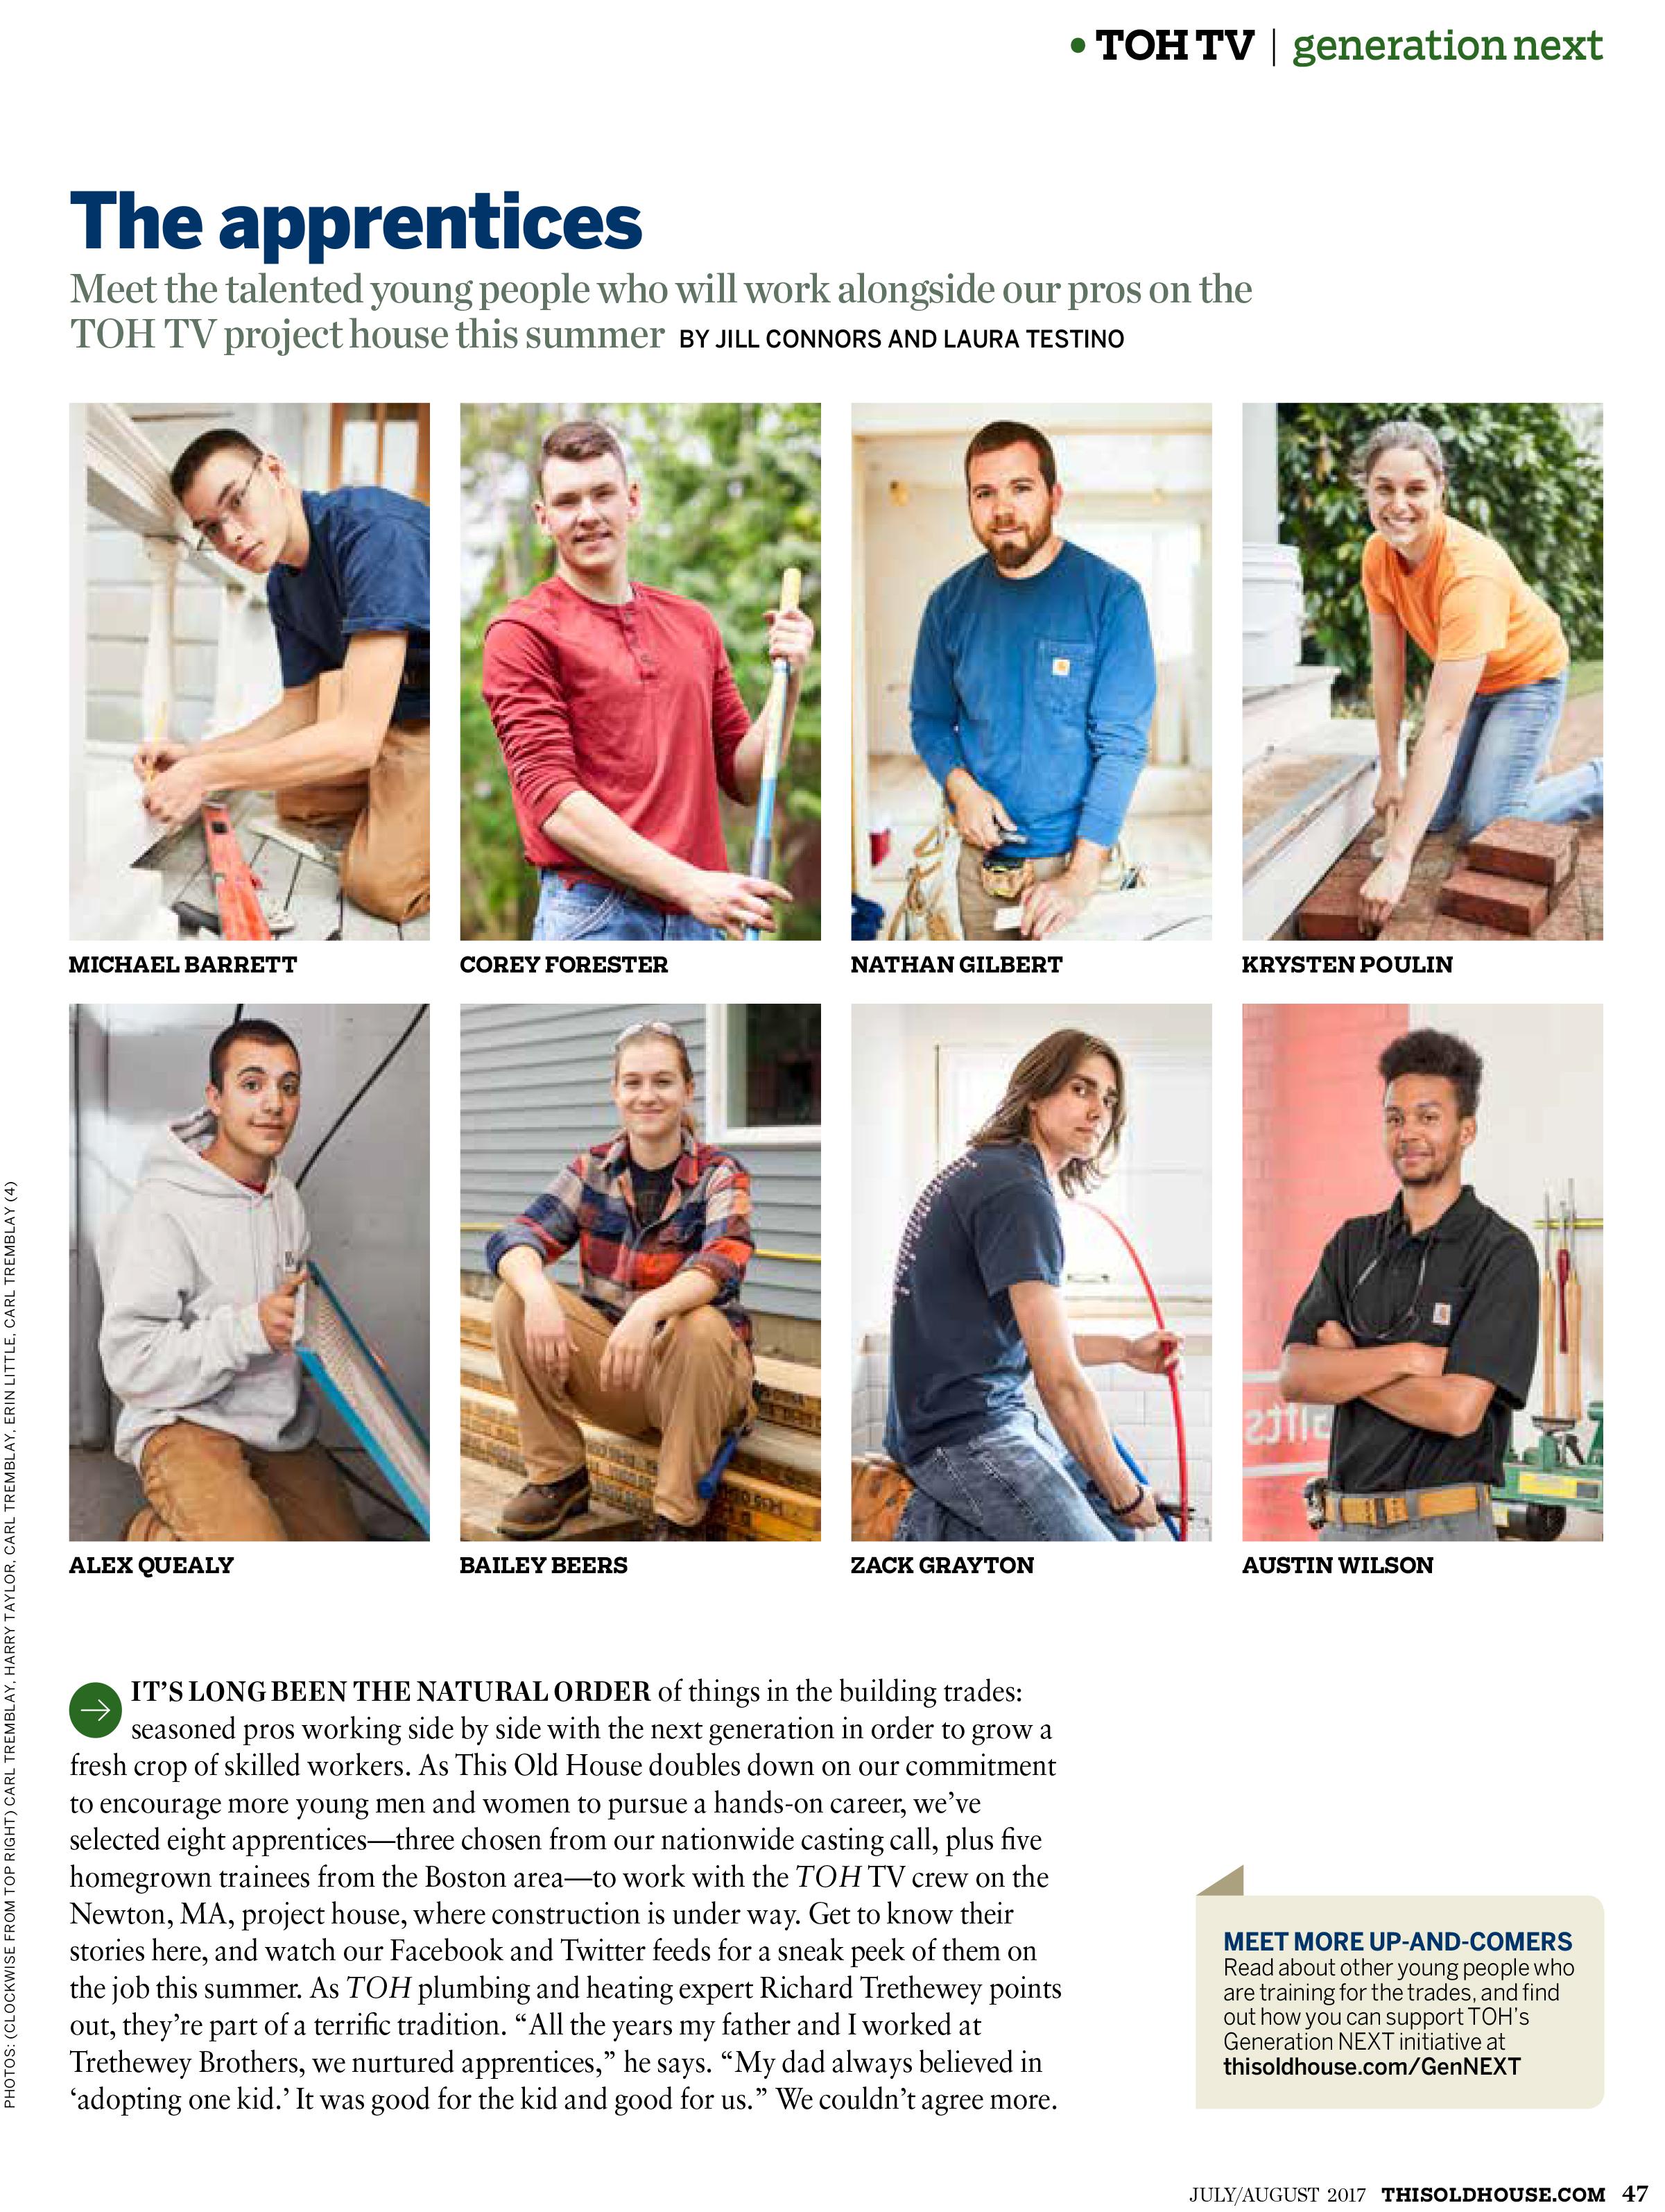 FINAL_0717 Apprentices-1.jpg